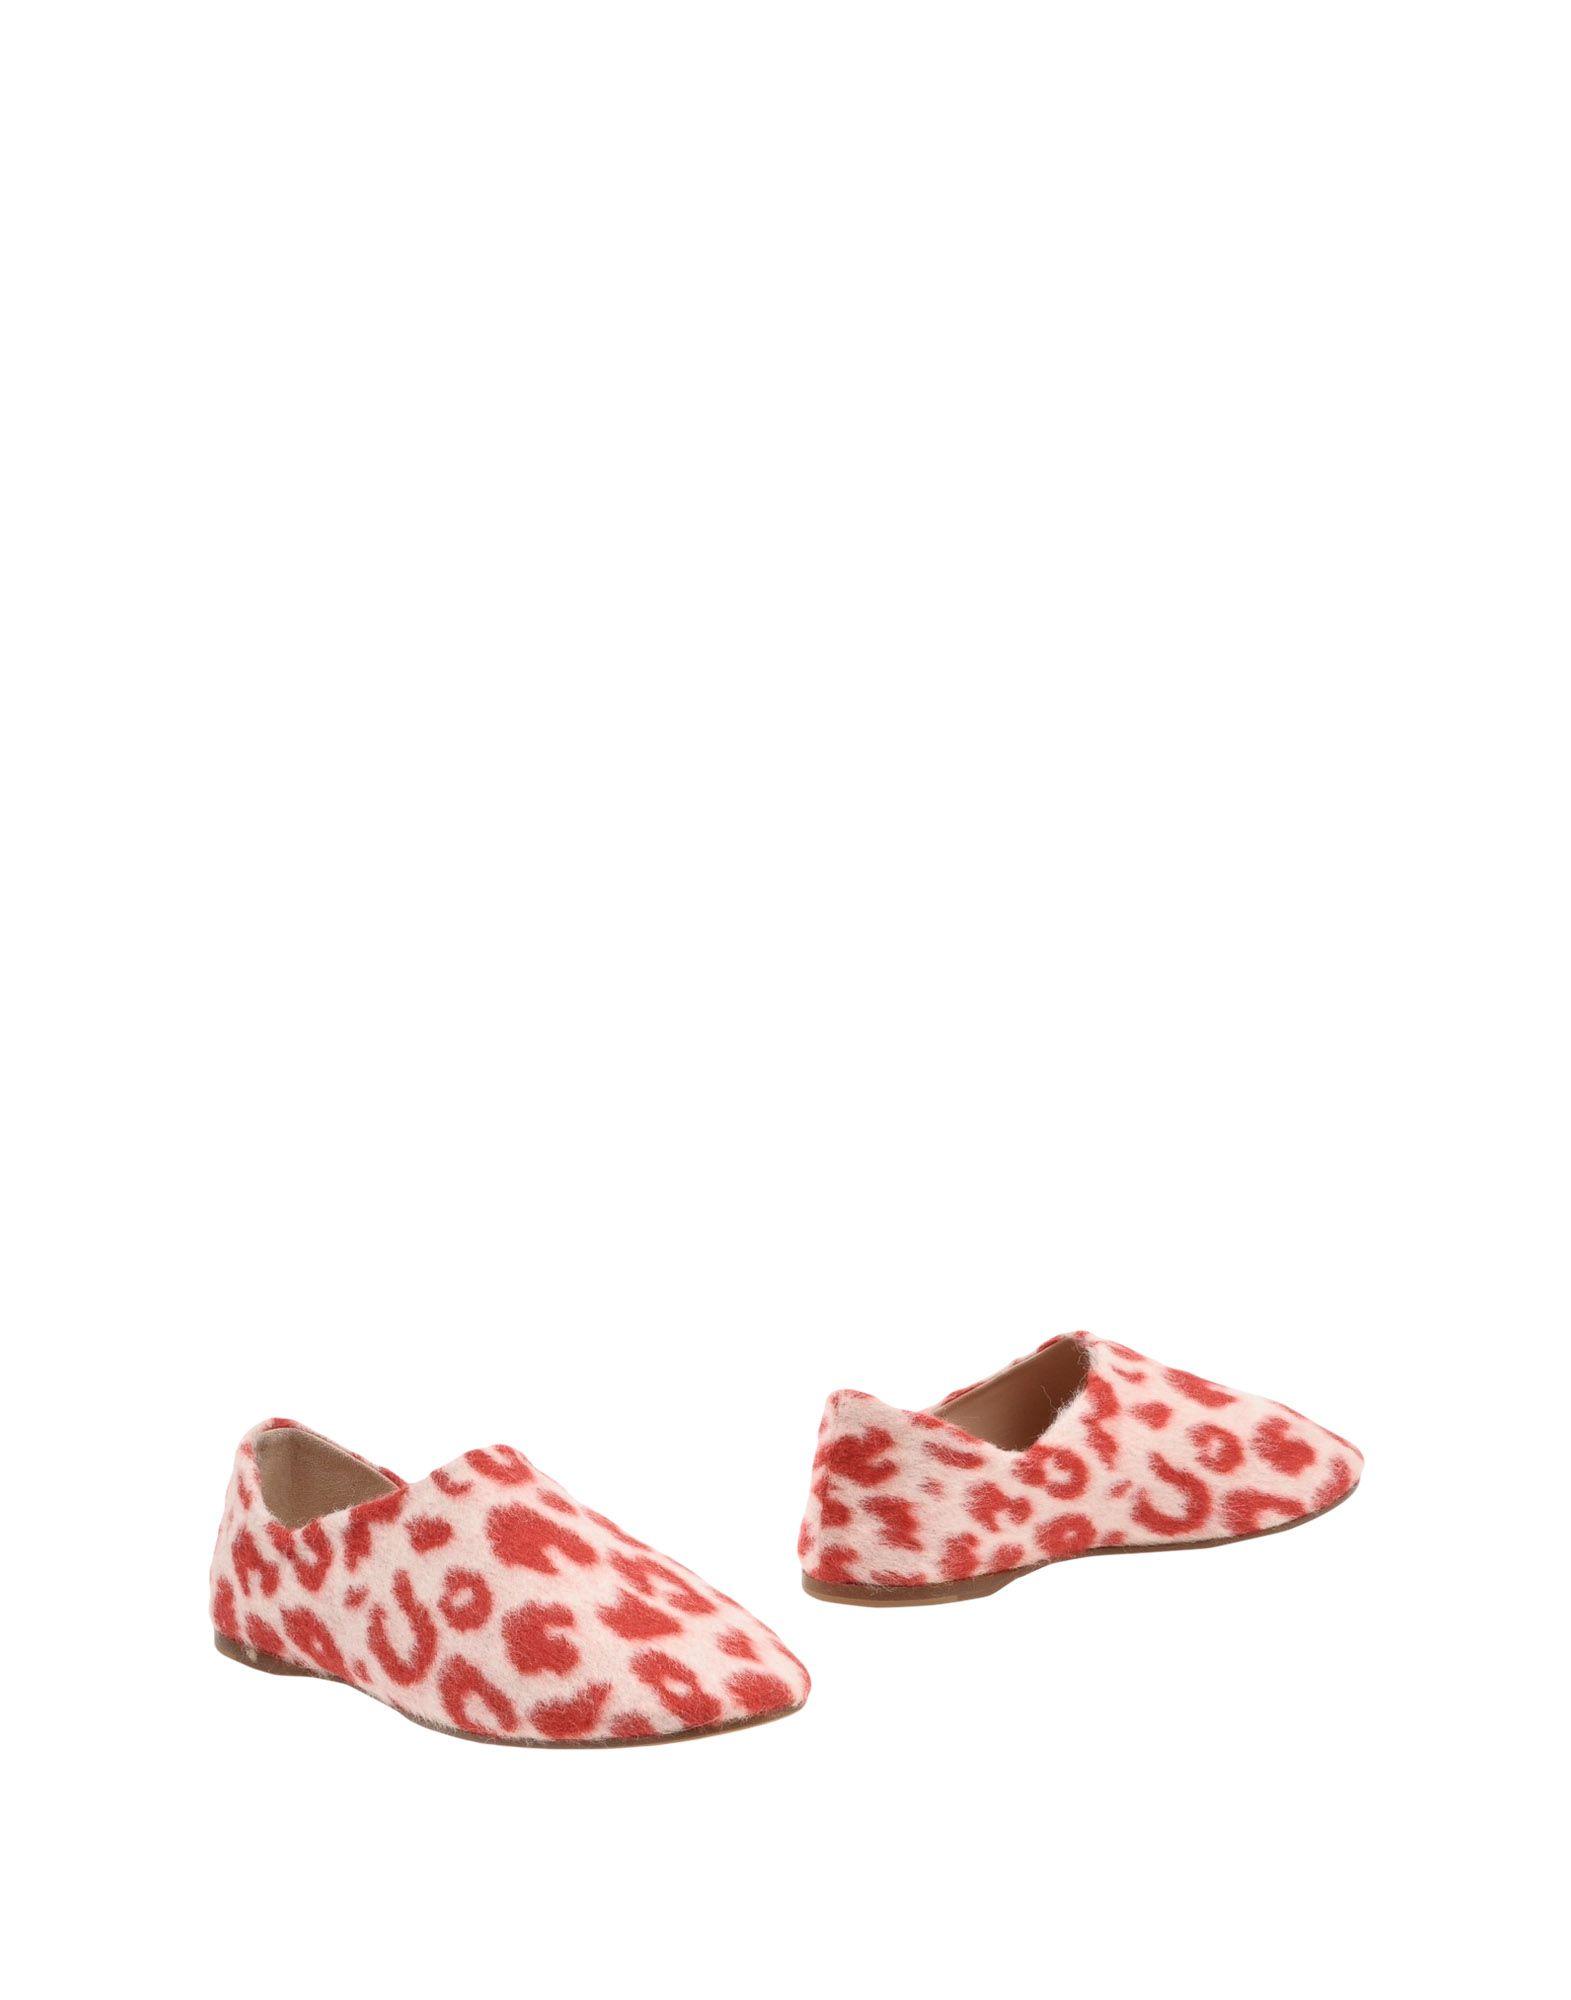 Acne Studios Stiefelette Damen  11285721WV 11285721WV  Neue Schuhe 28064f